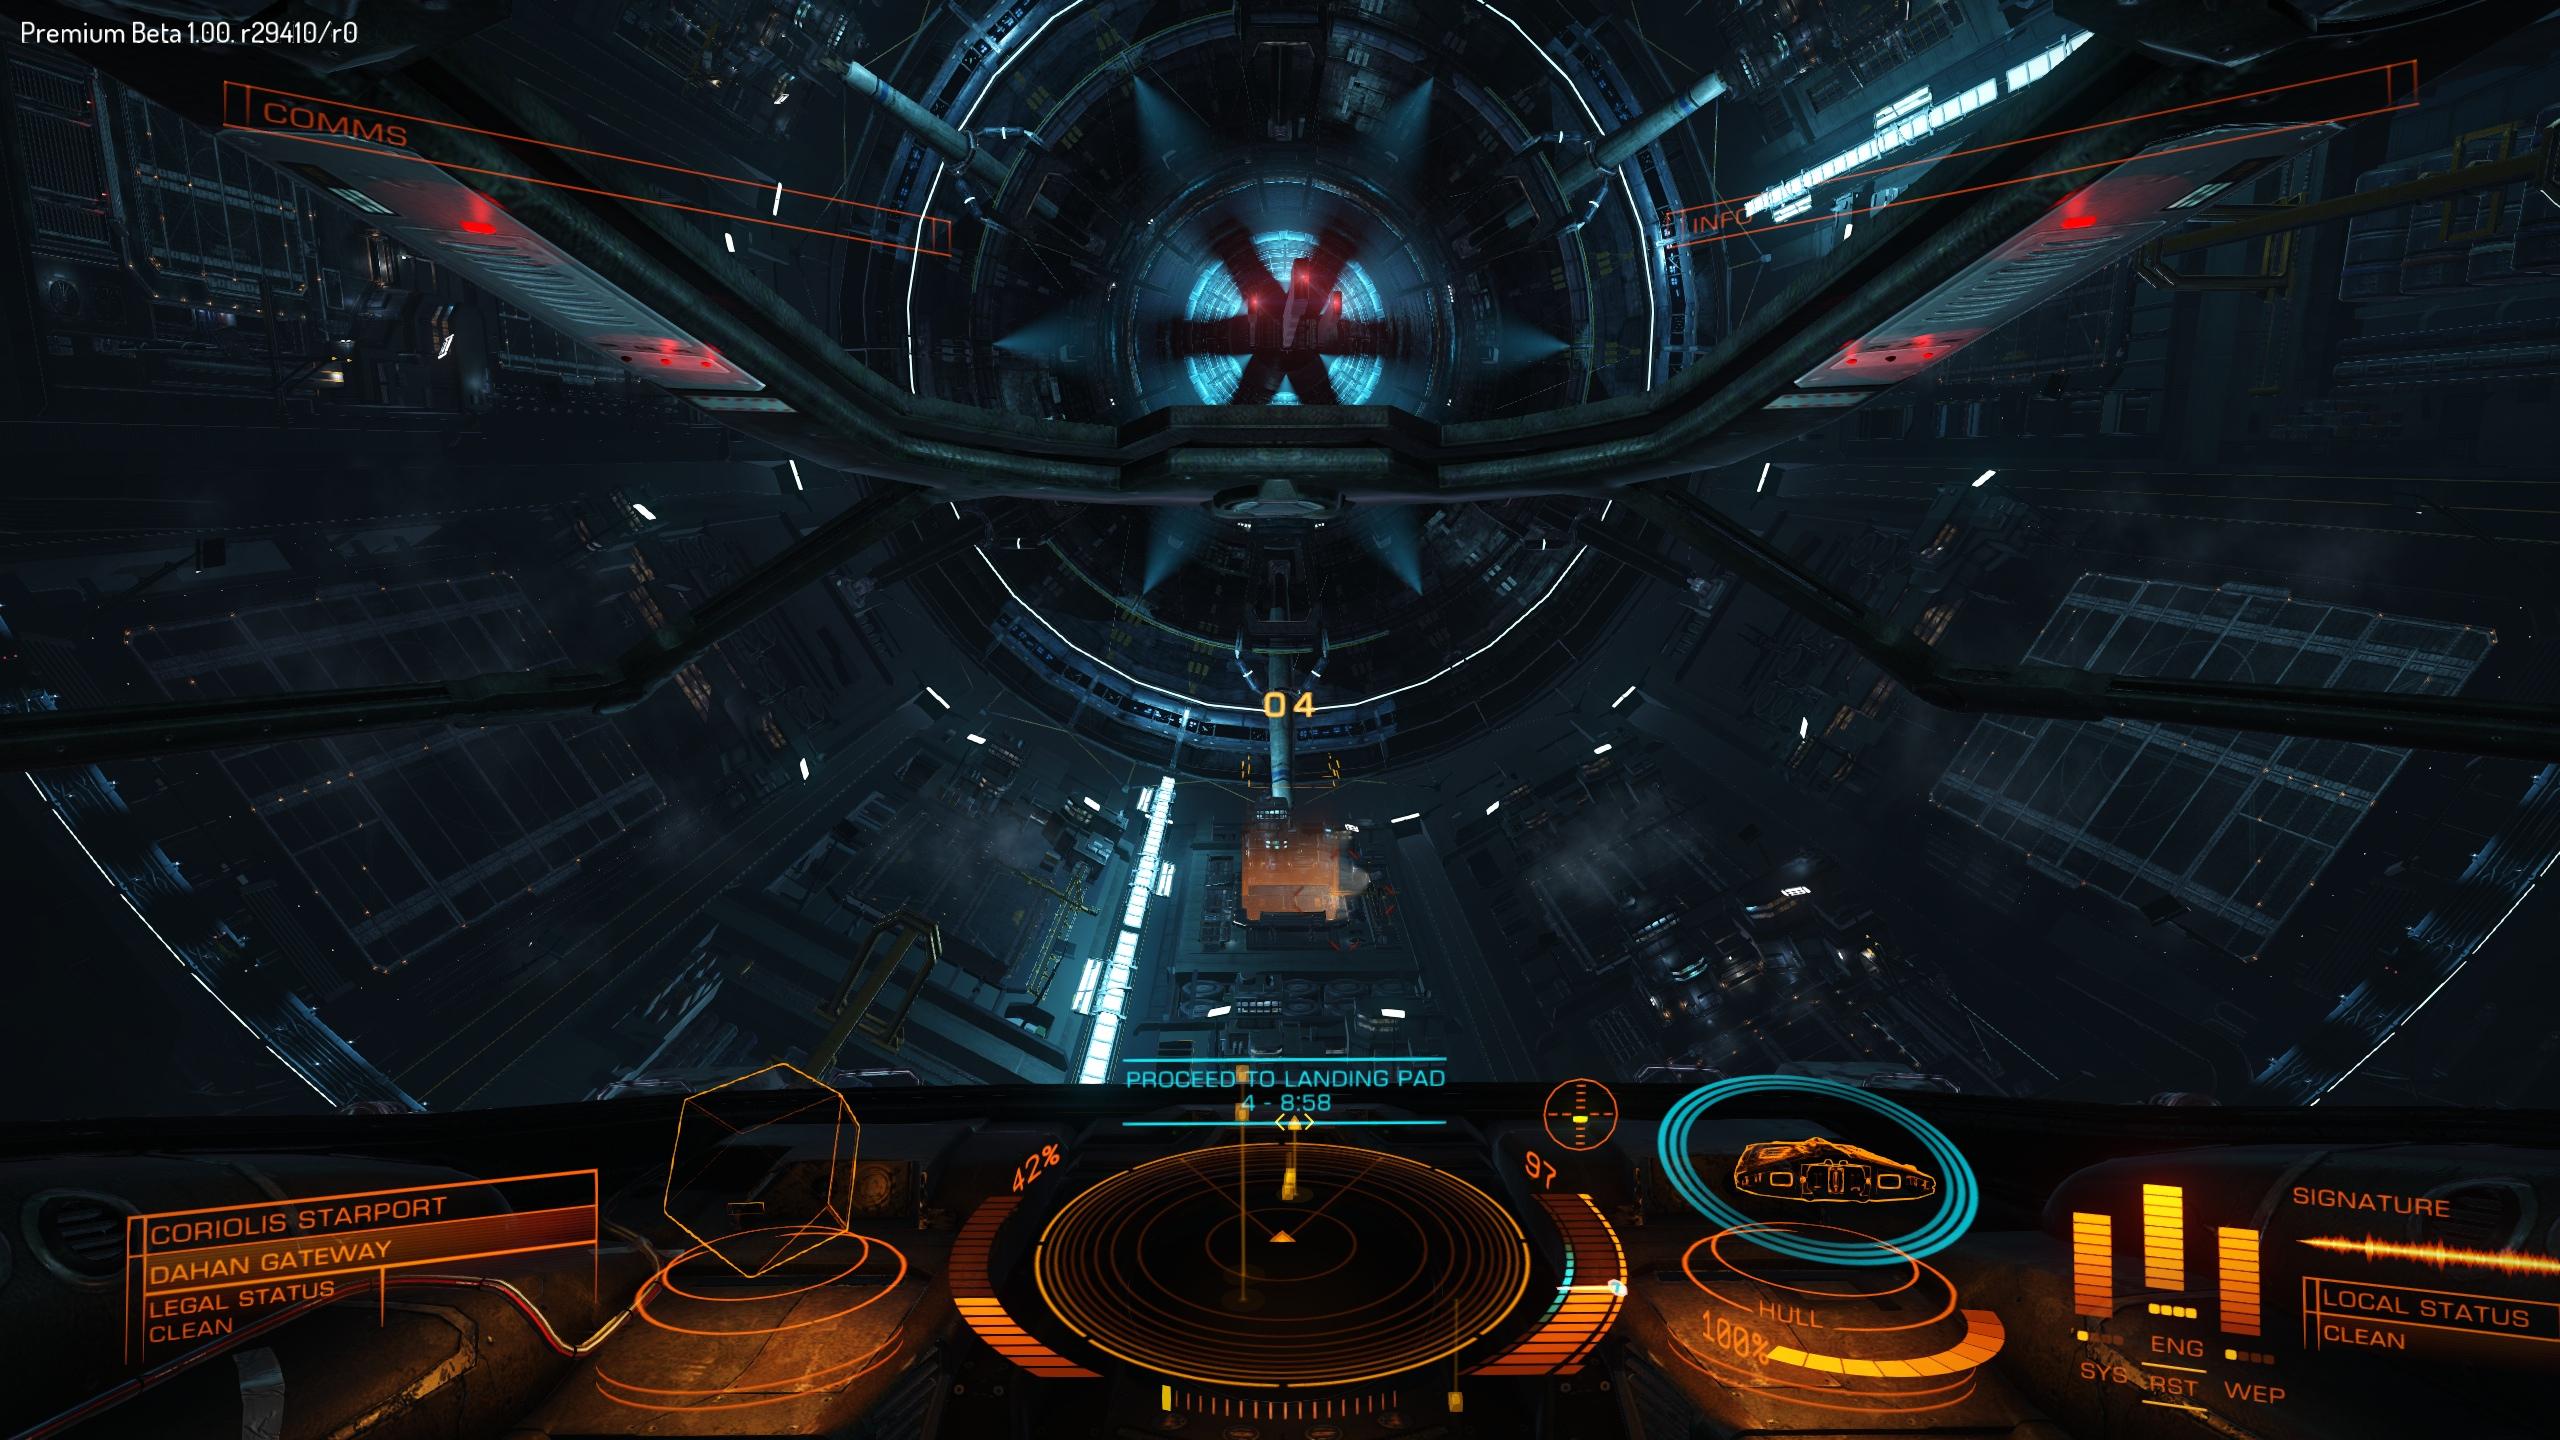 Inside Dahan Gateway, making my way to pad 4.